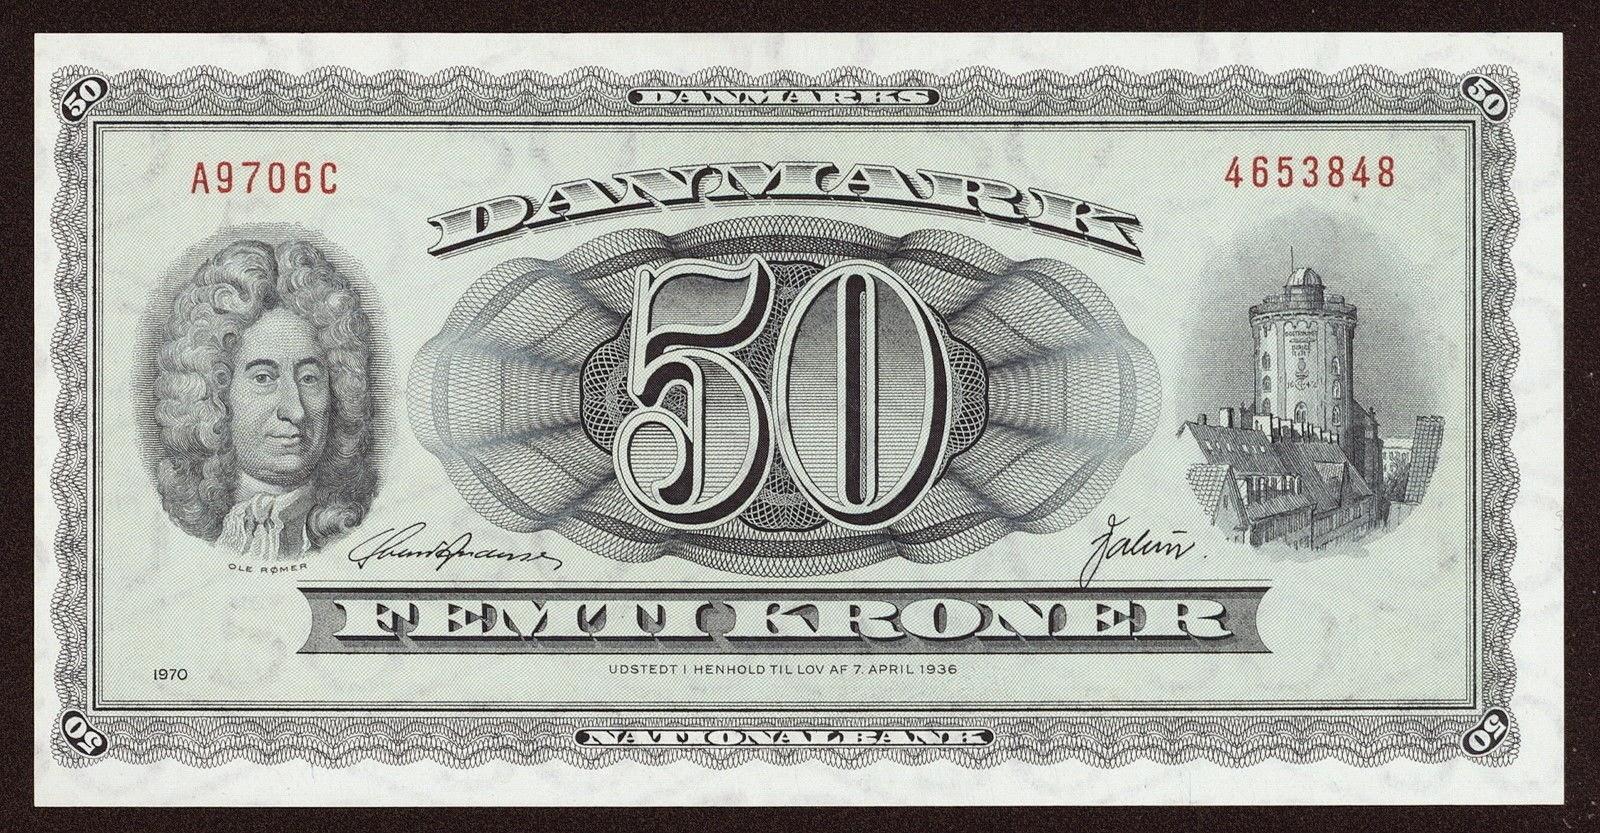 Banknotes of Denmark 50 krone banknote 1970 Ole Christensen Rømer